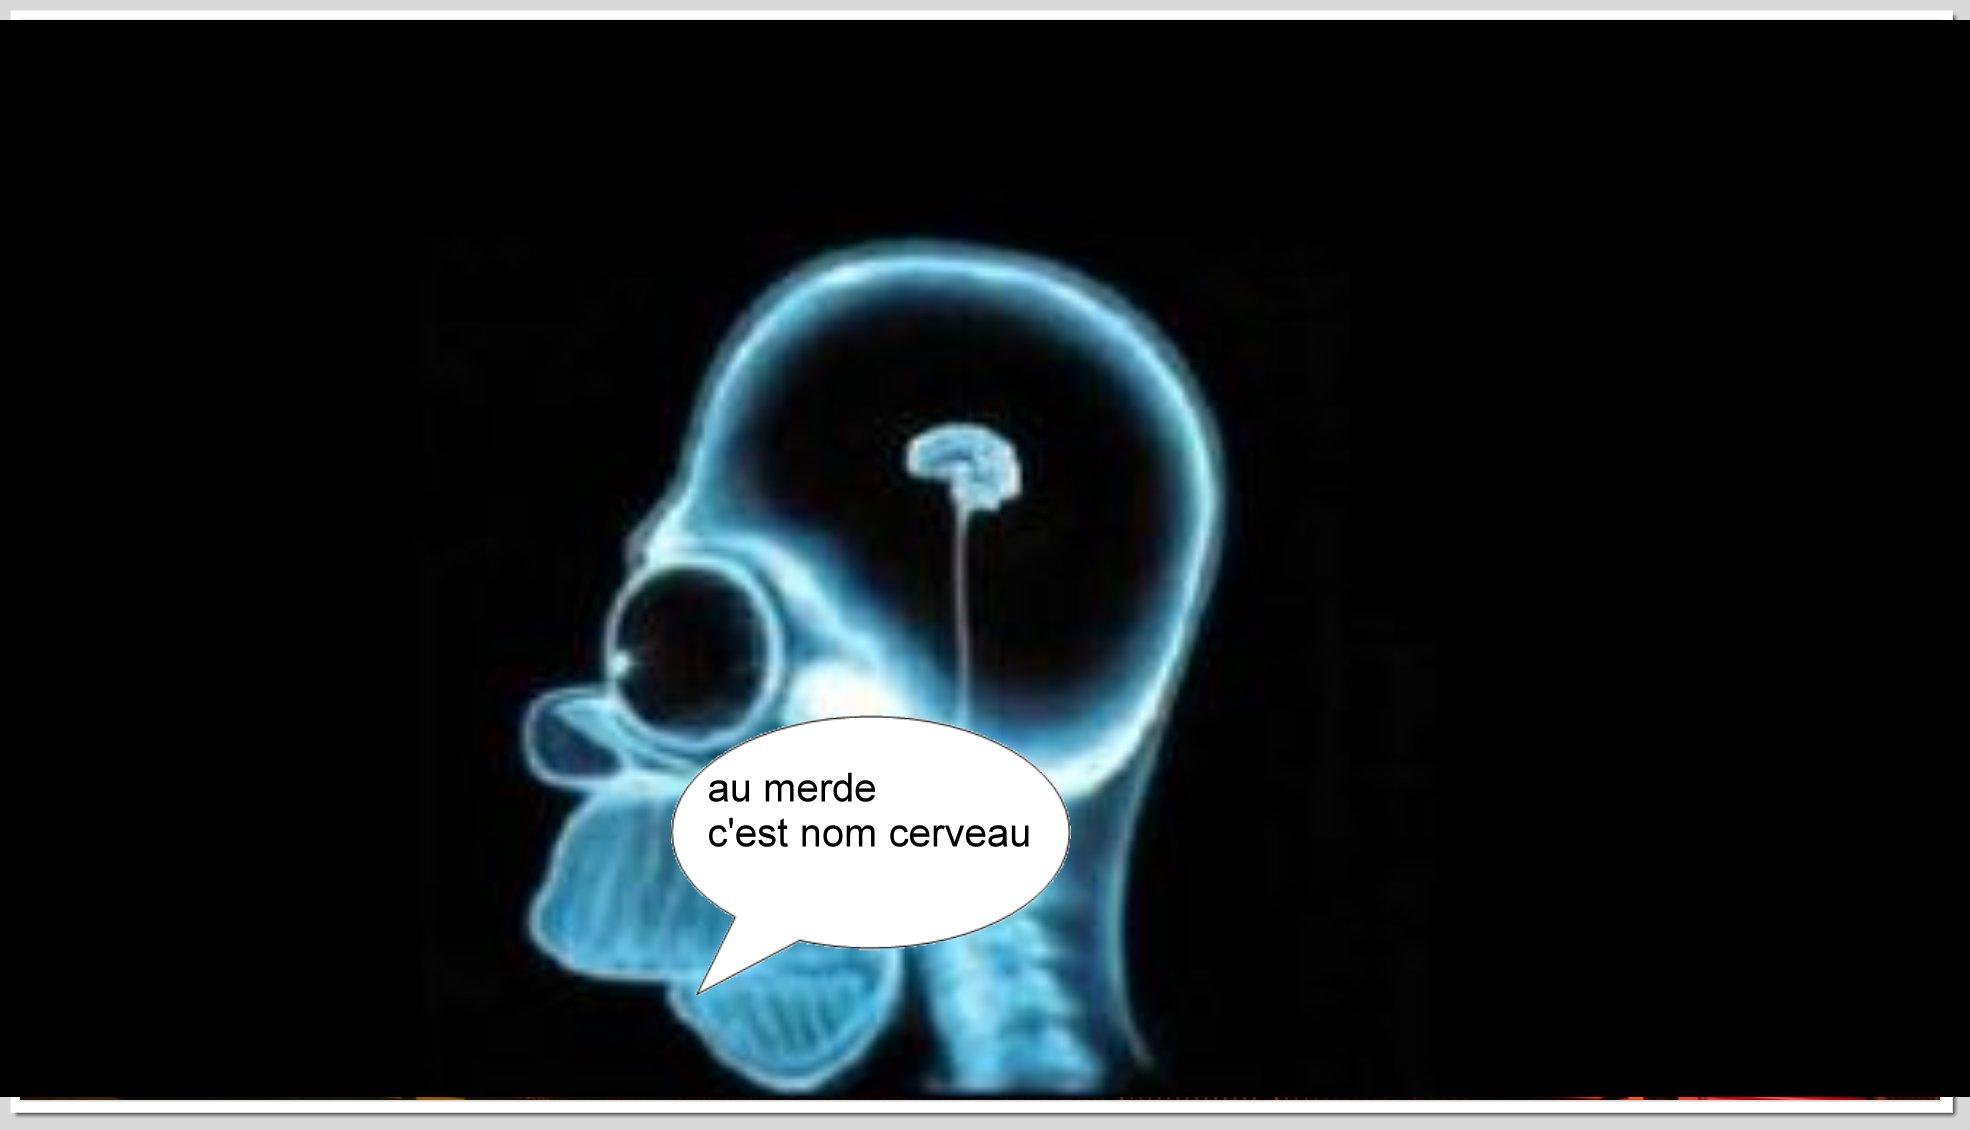 cerveau - Photos Humour